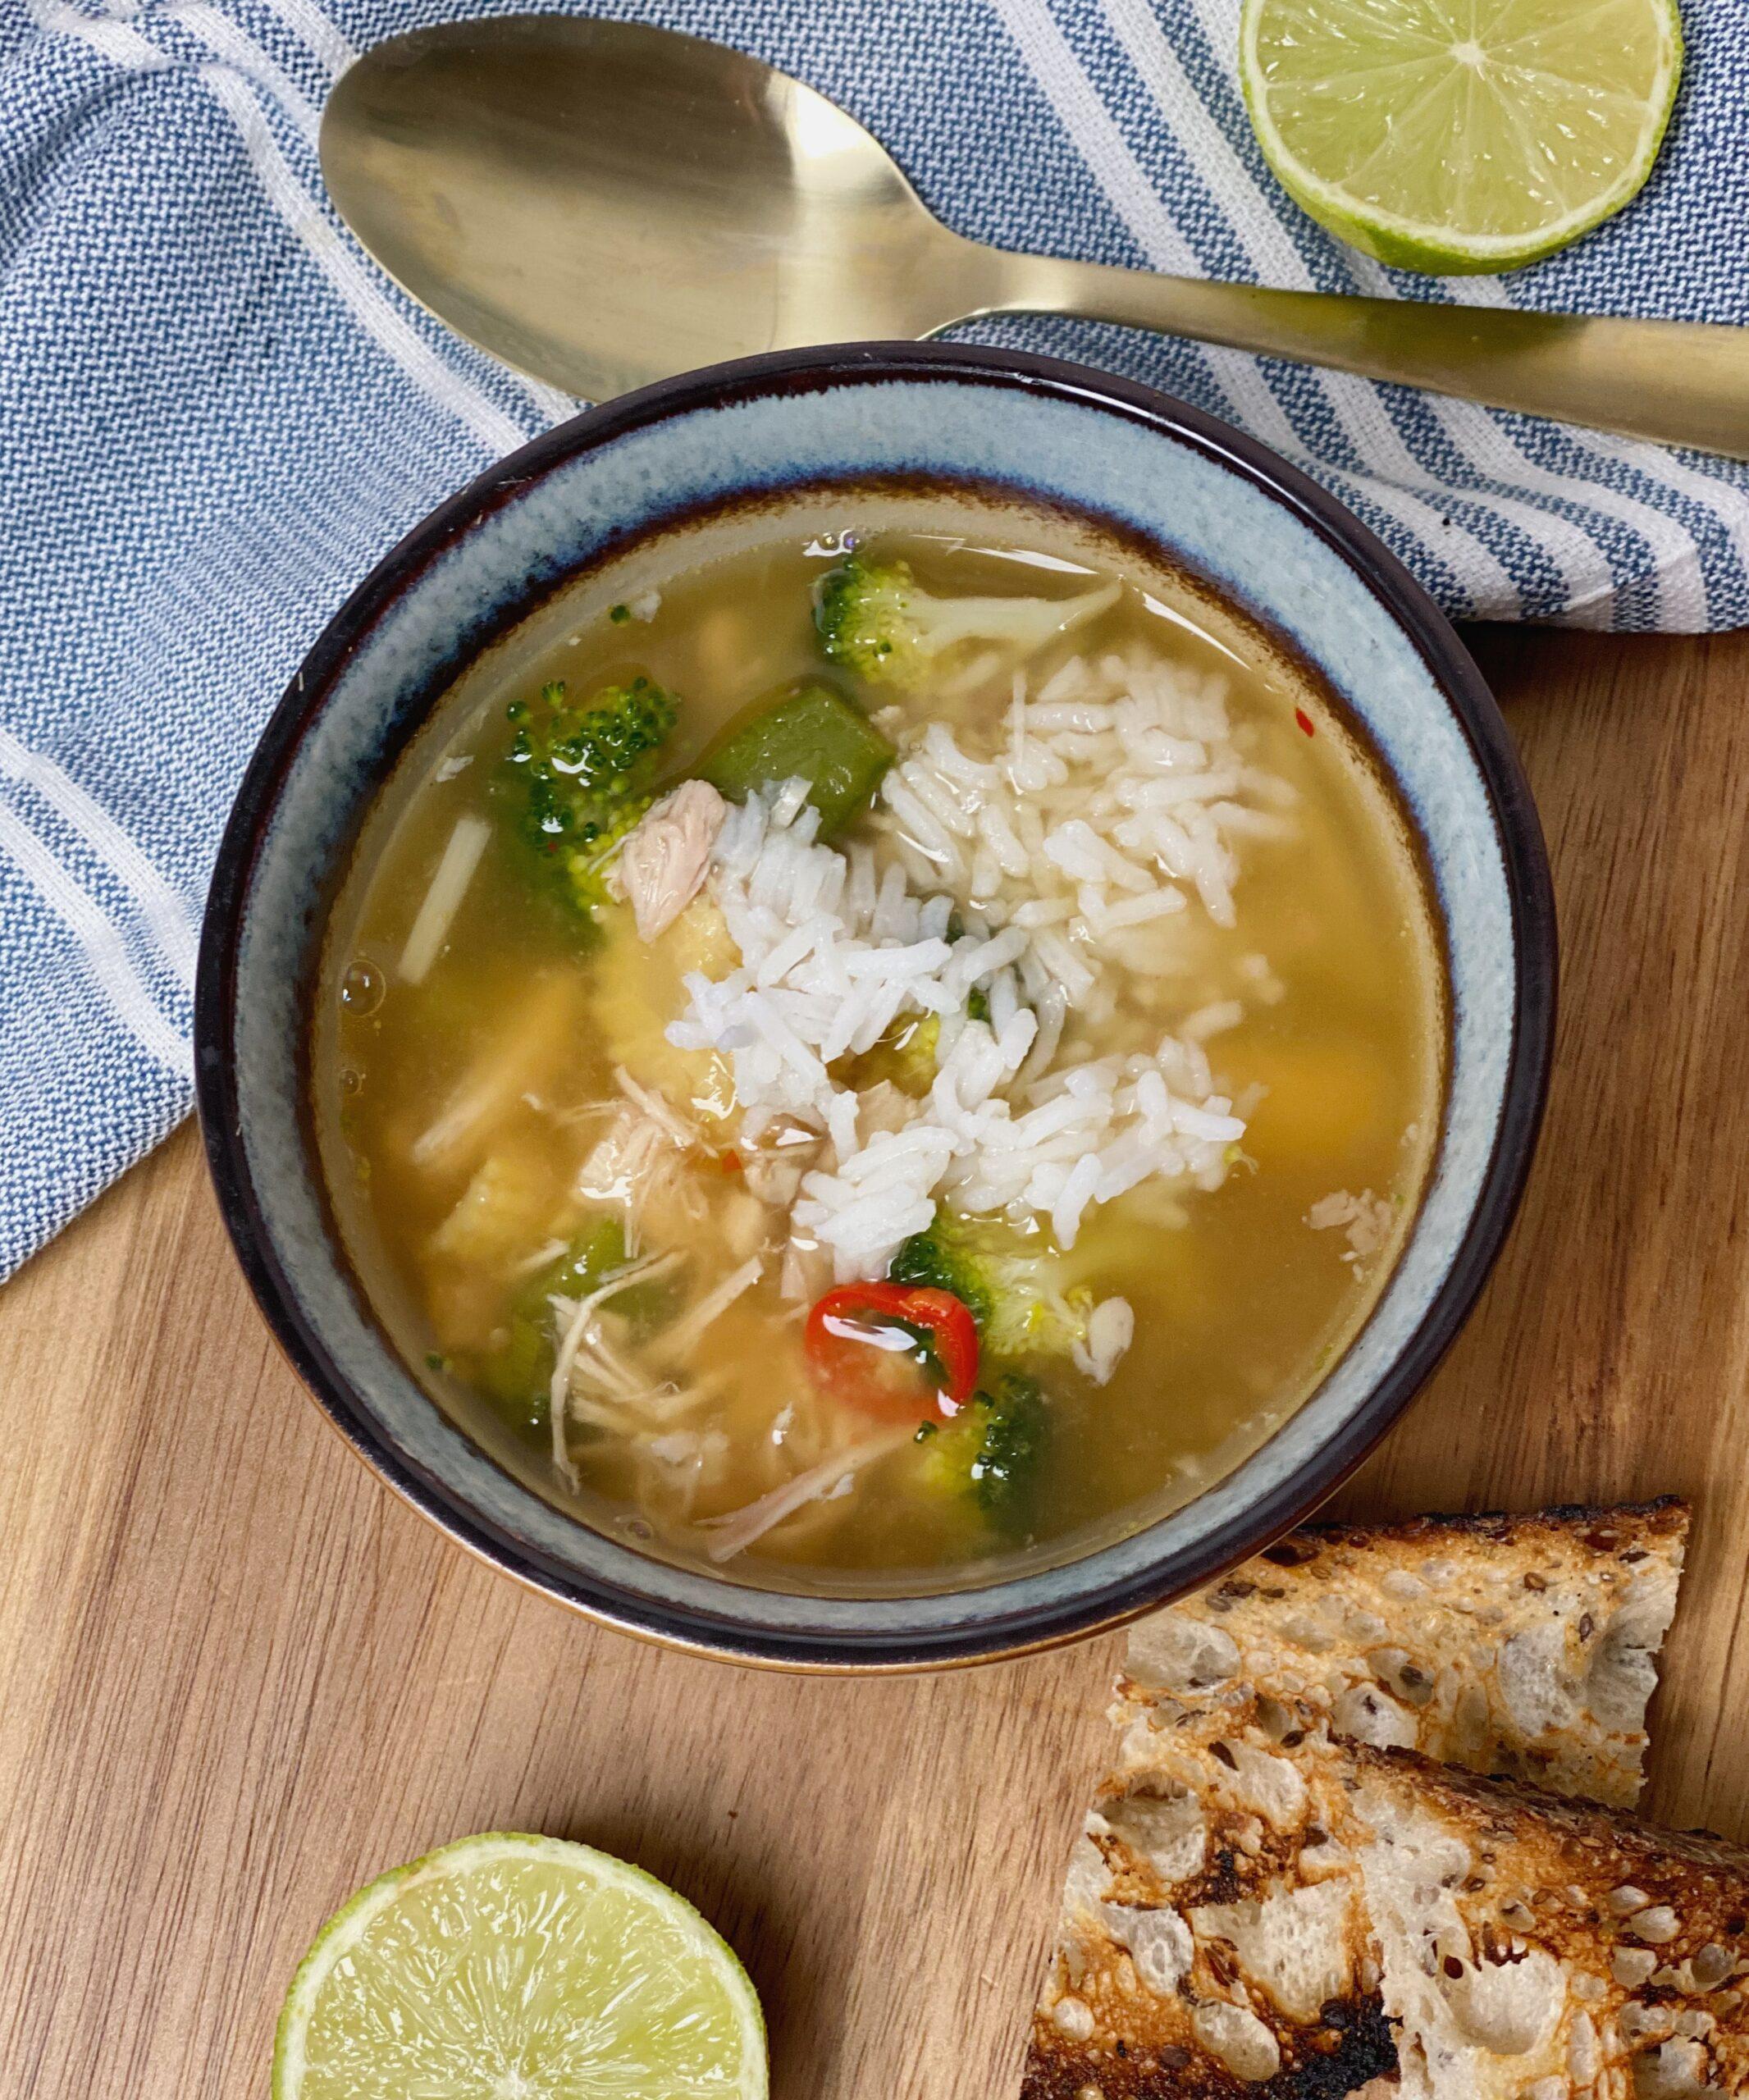 Kyllingesuppe med ris